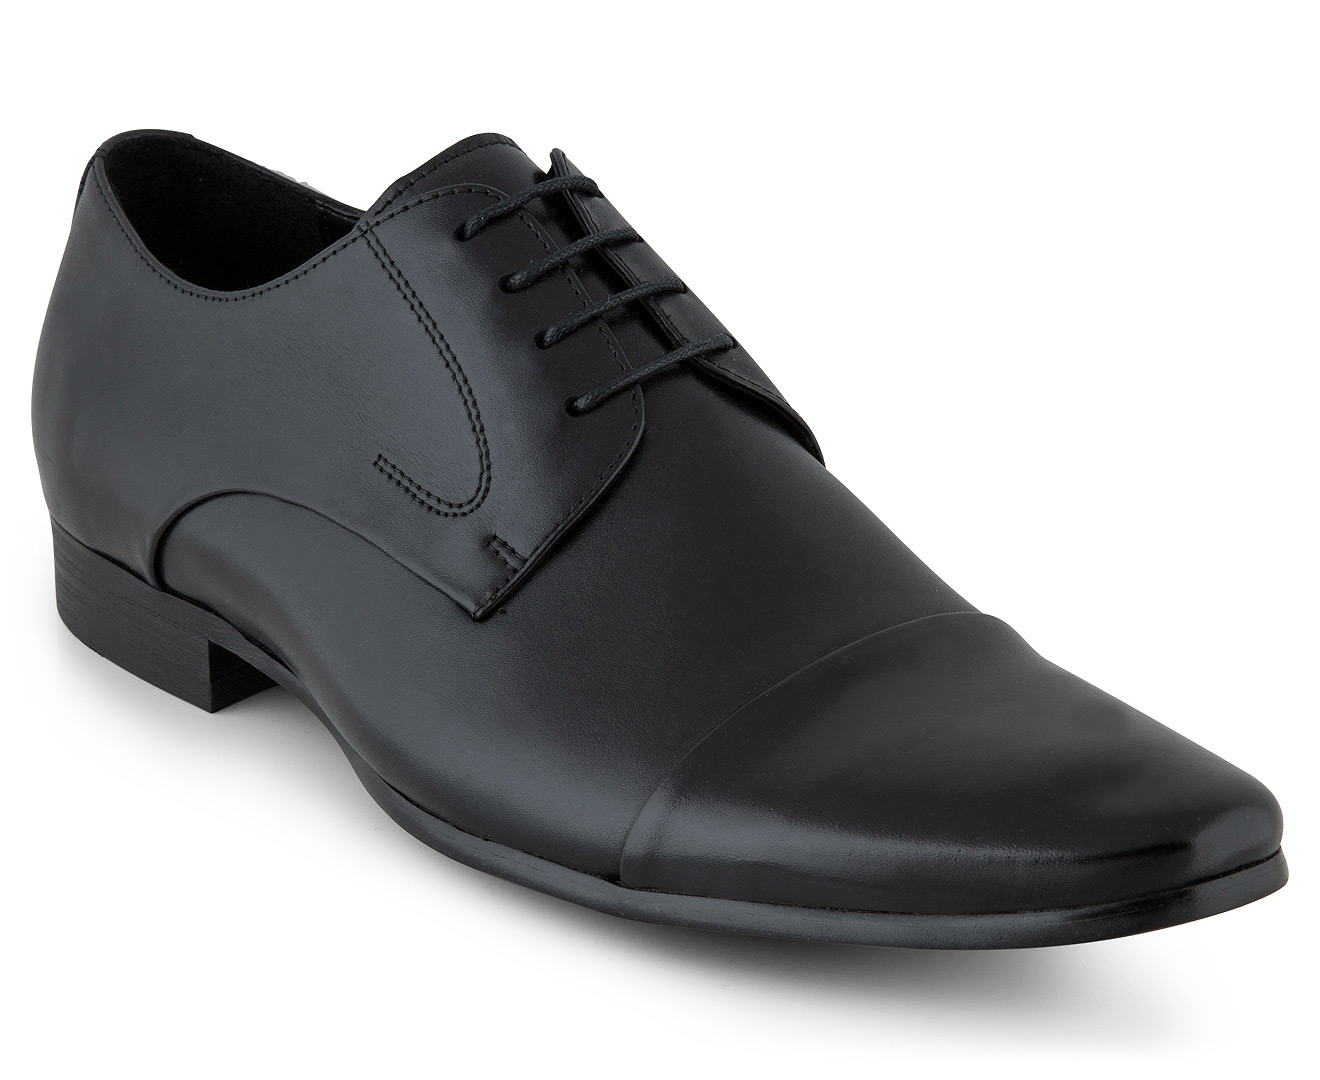 Windsor Smith Men's Justinn Leather